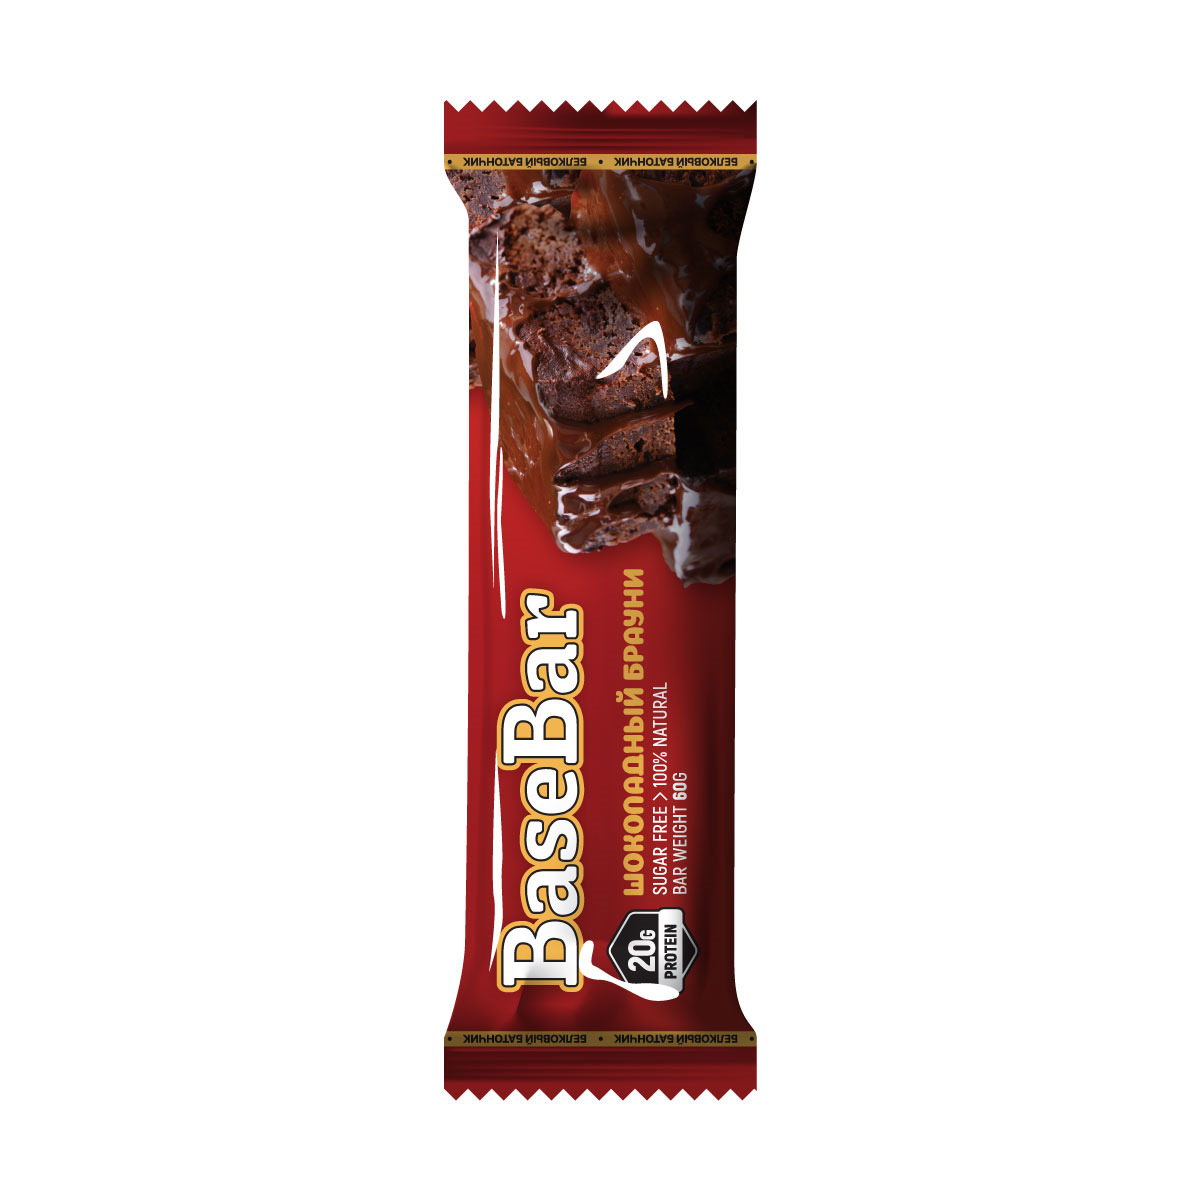 Батончик протеиновый Base Bar Шоколадный брауни, 60 г